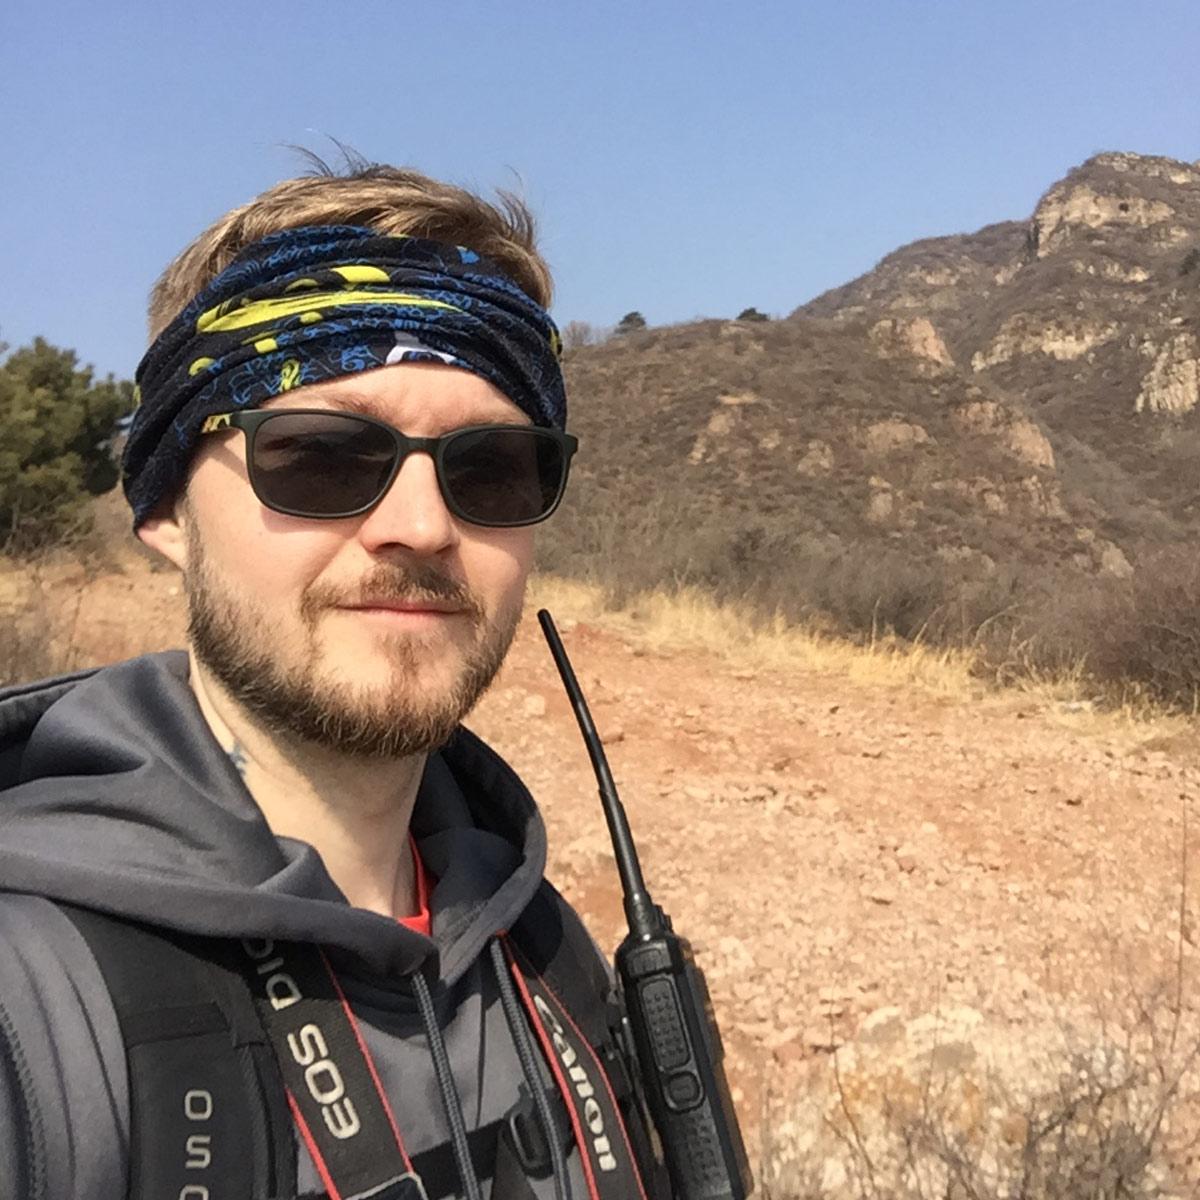 Trainer John Alsobrooks navigating during a hiking trip